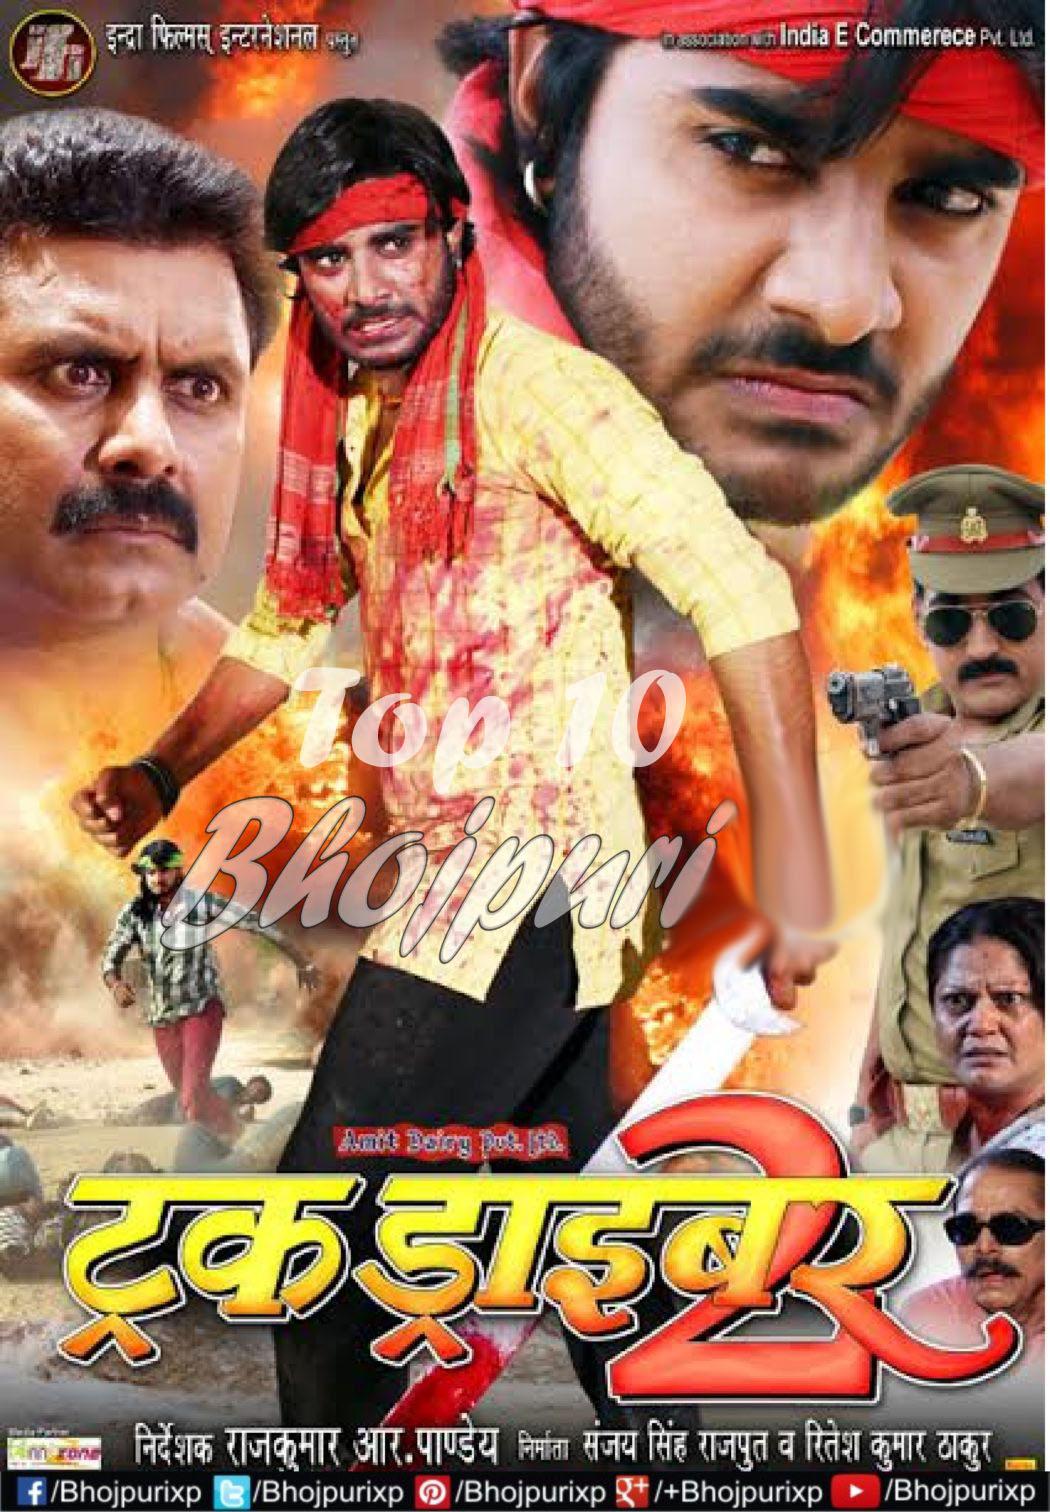 Bhojpuri Movie Truck Driver 2  Trailer video youtube Feat Actor  Pawan Singh, Viraj Bhatt, Nidhi Jha , Sushil Singh first look poster, movie wallpaper